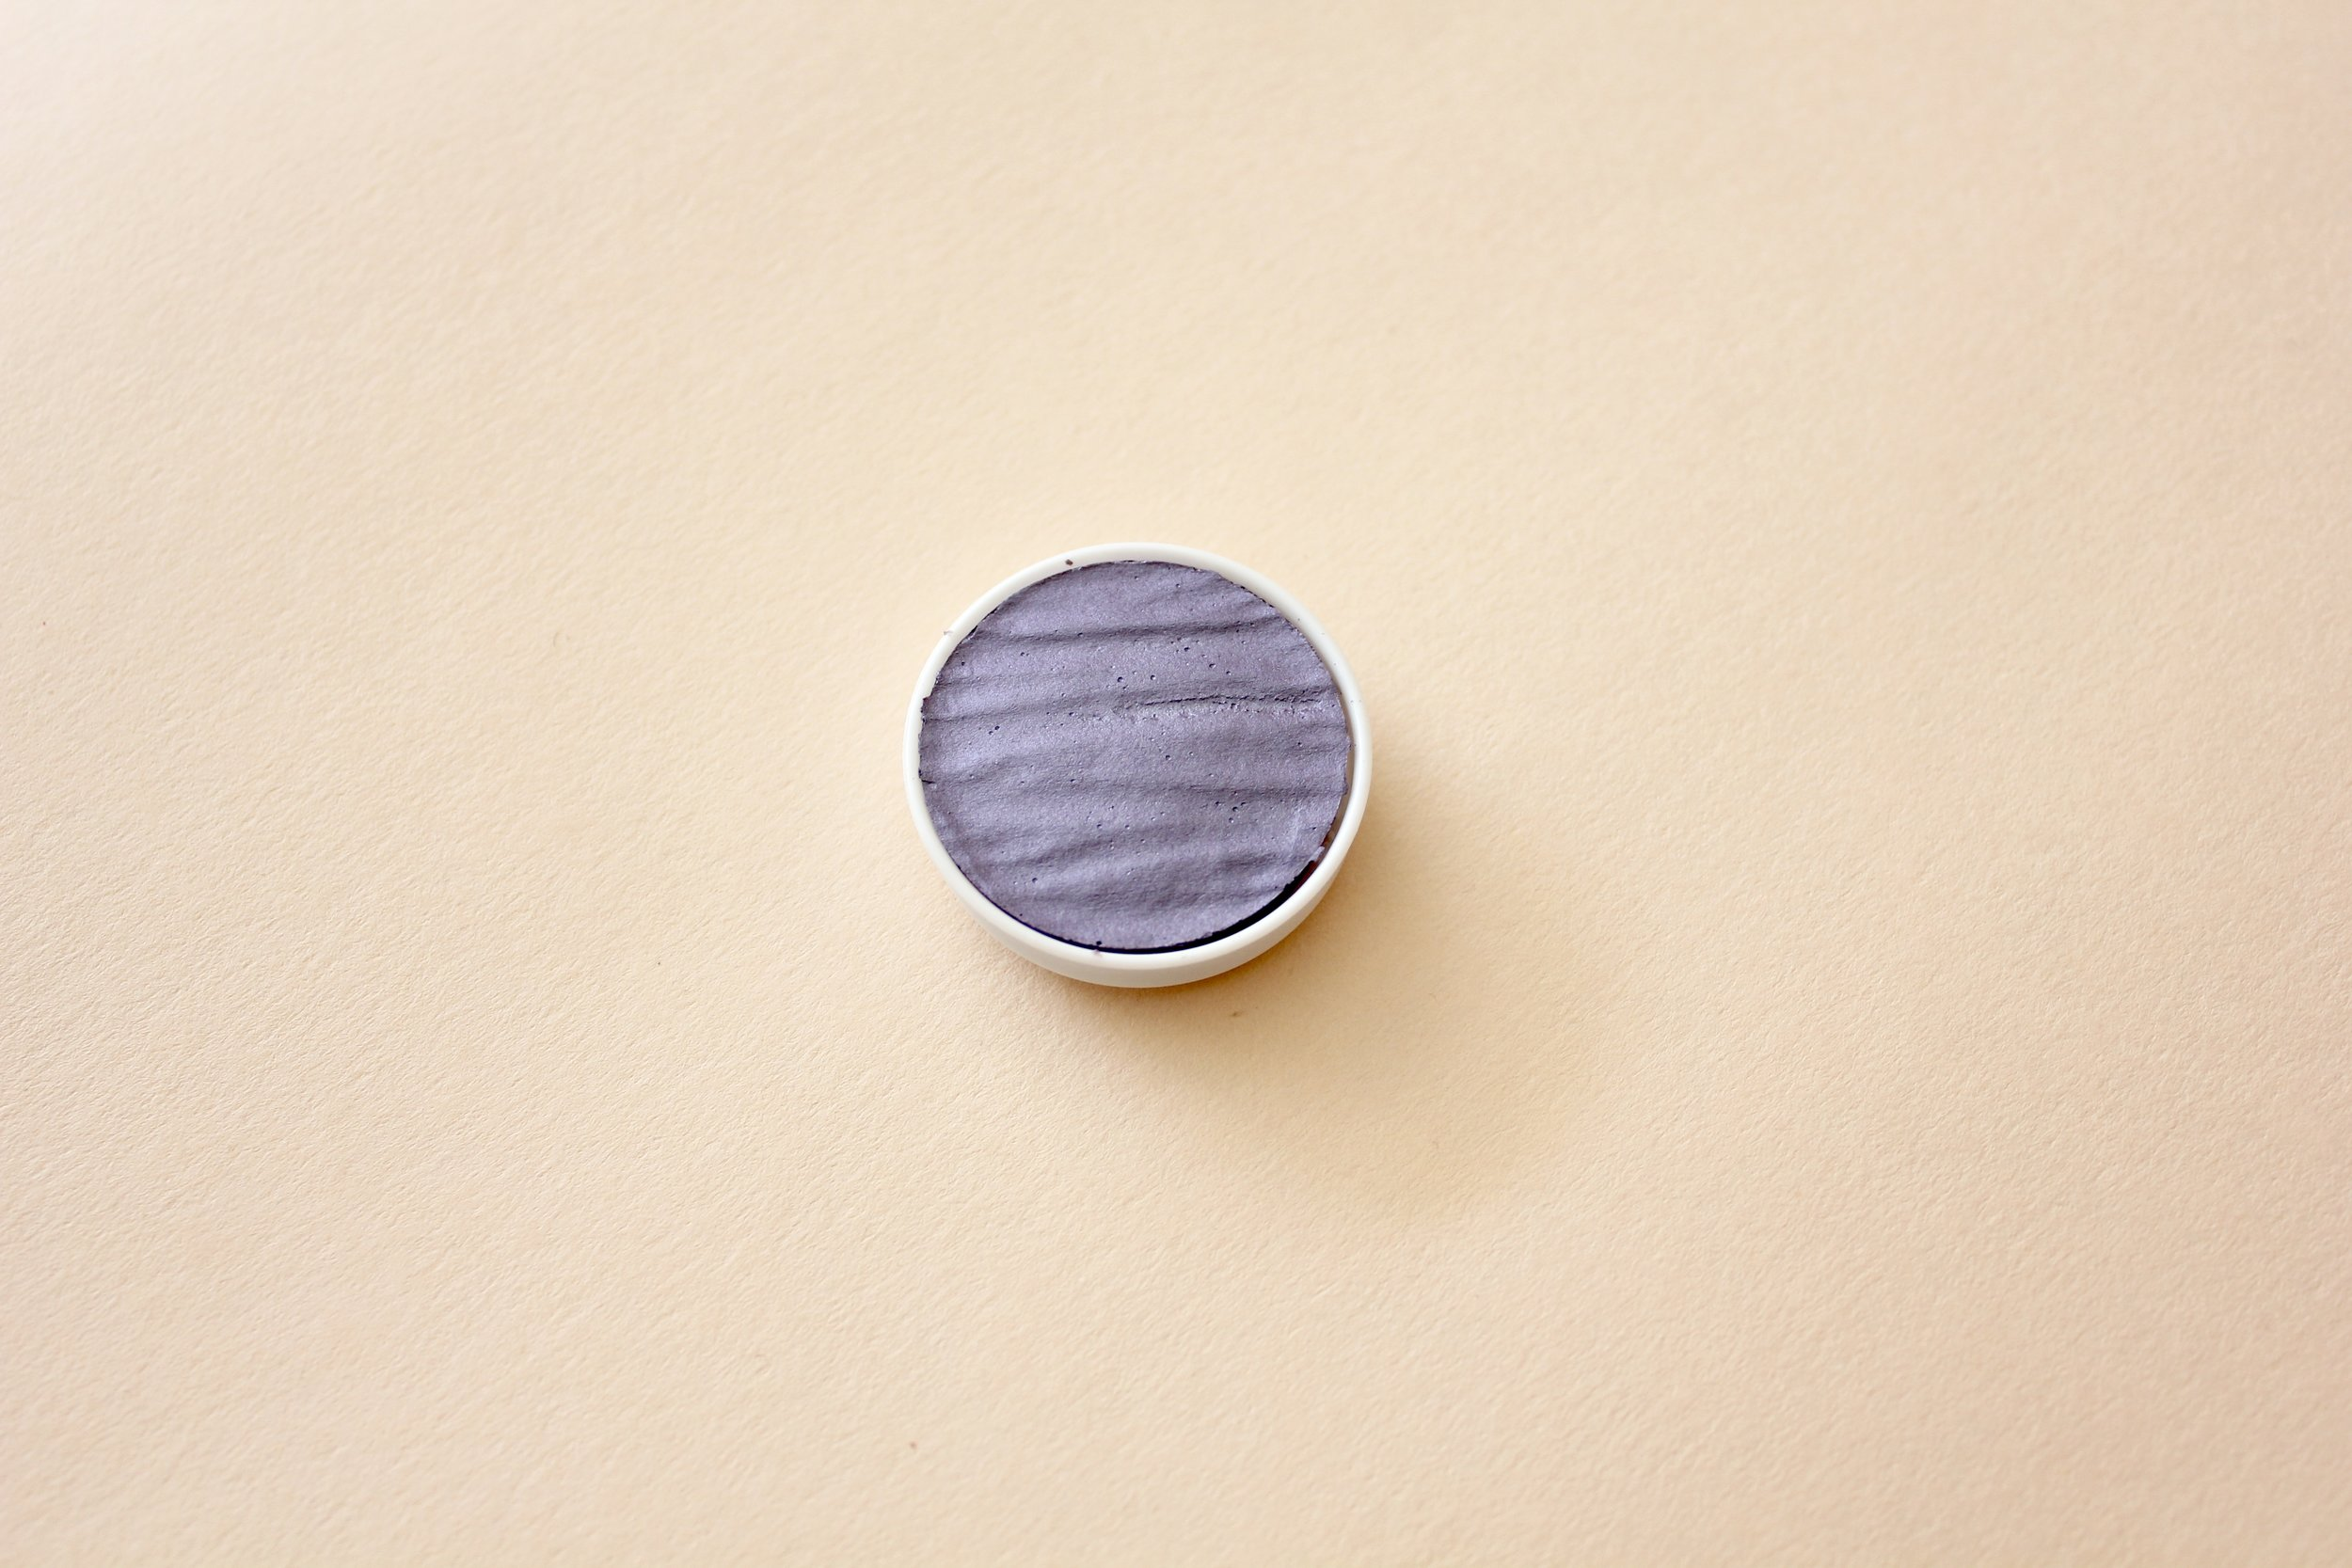 LR00102 Coliro Lavender 30mm ($8)